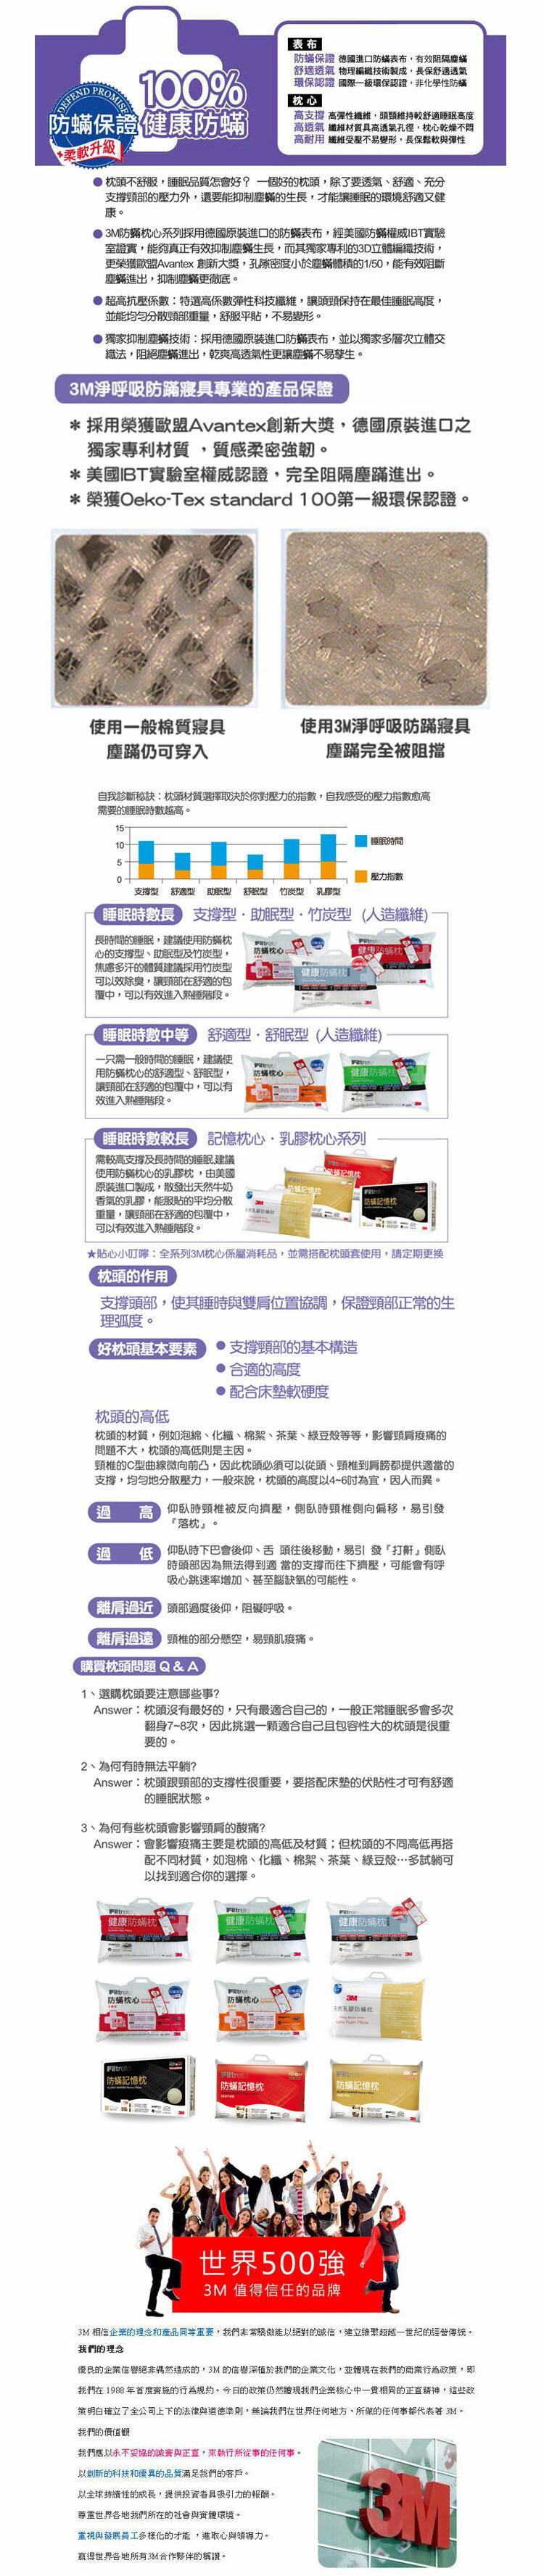 3M 防蹣枕頭(標準枕心)-加厚型舒適枕 AP-KA1 - 2